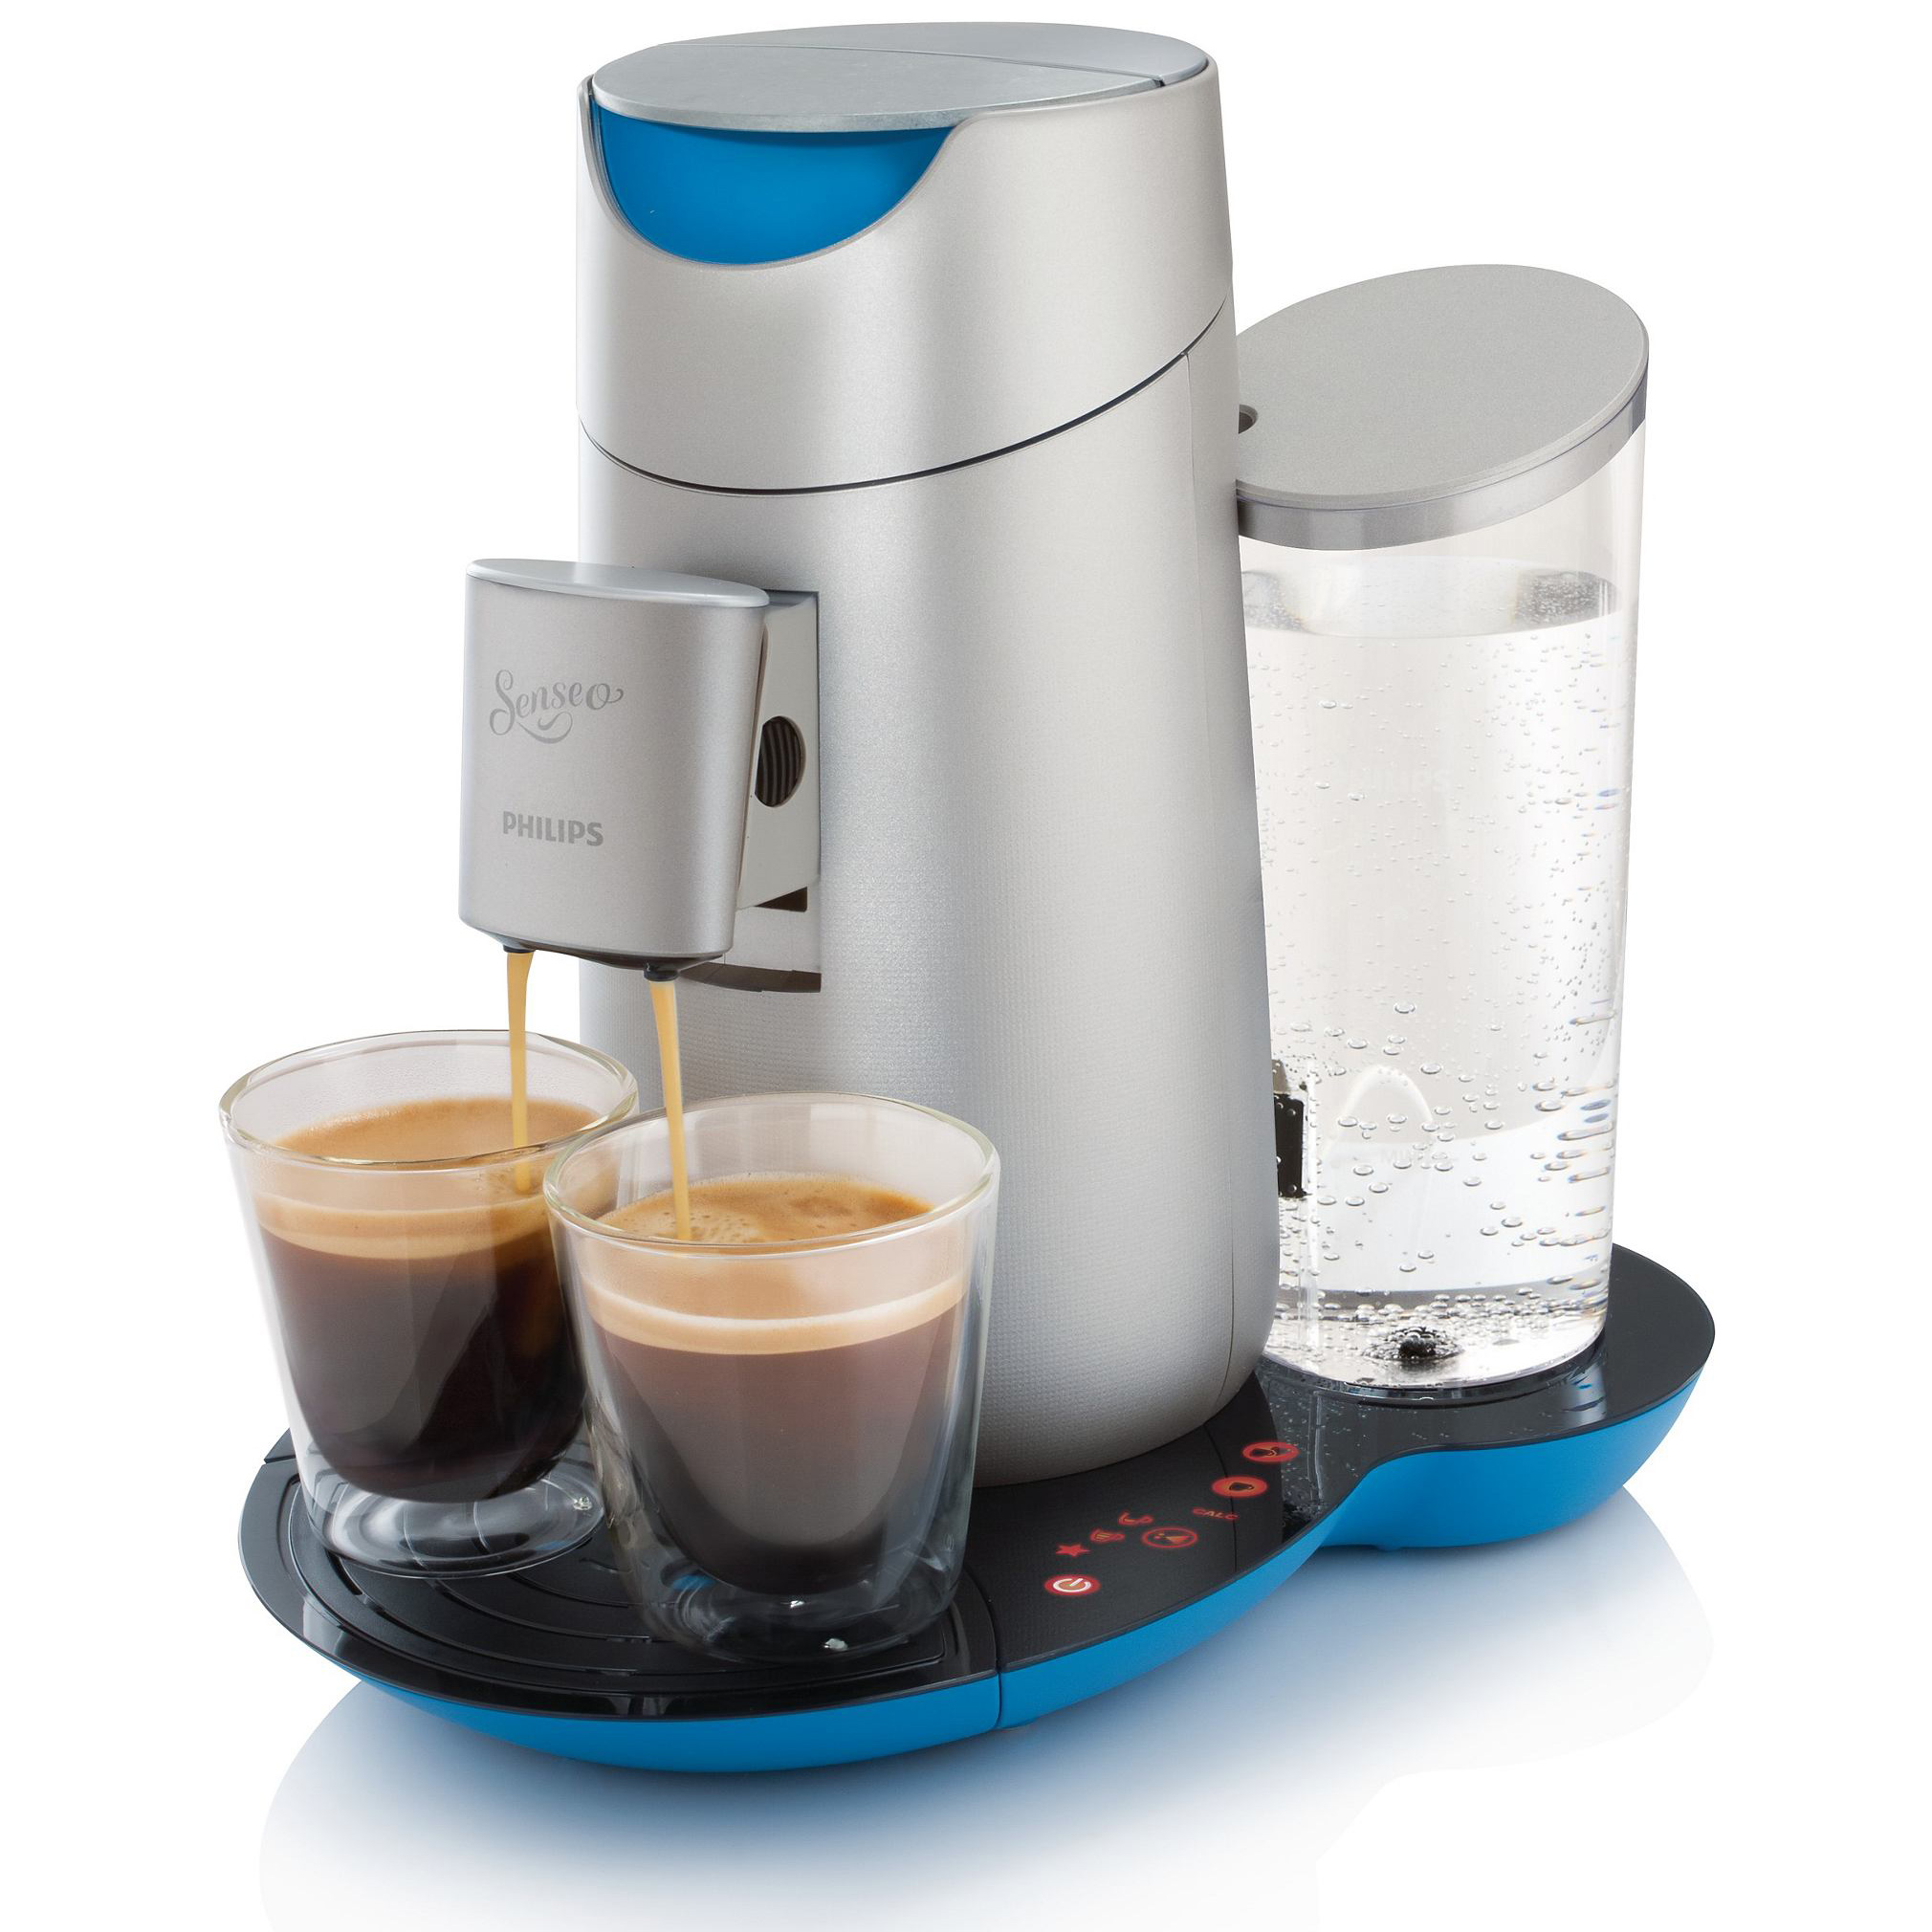 philips senseo twist coffee pod machine hd7872 10 caribbean blue silver at about shop. Black Bedroom Furniture Sets. Home Design Ideas